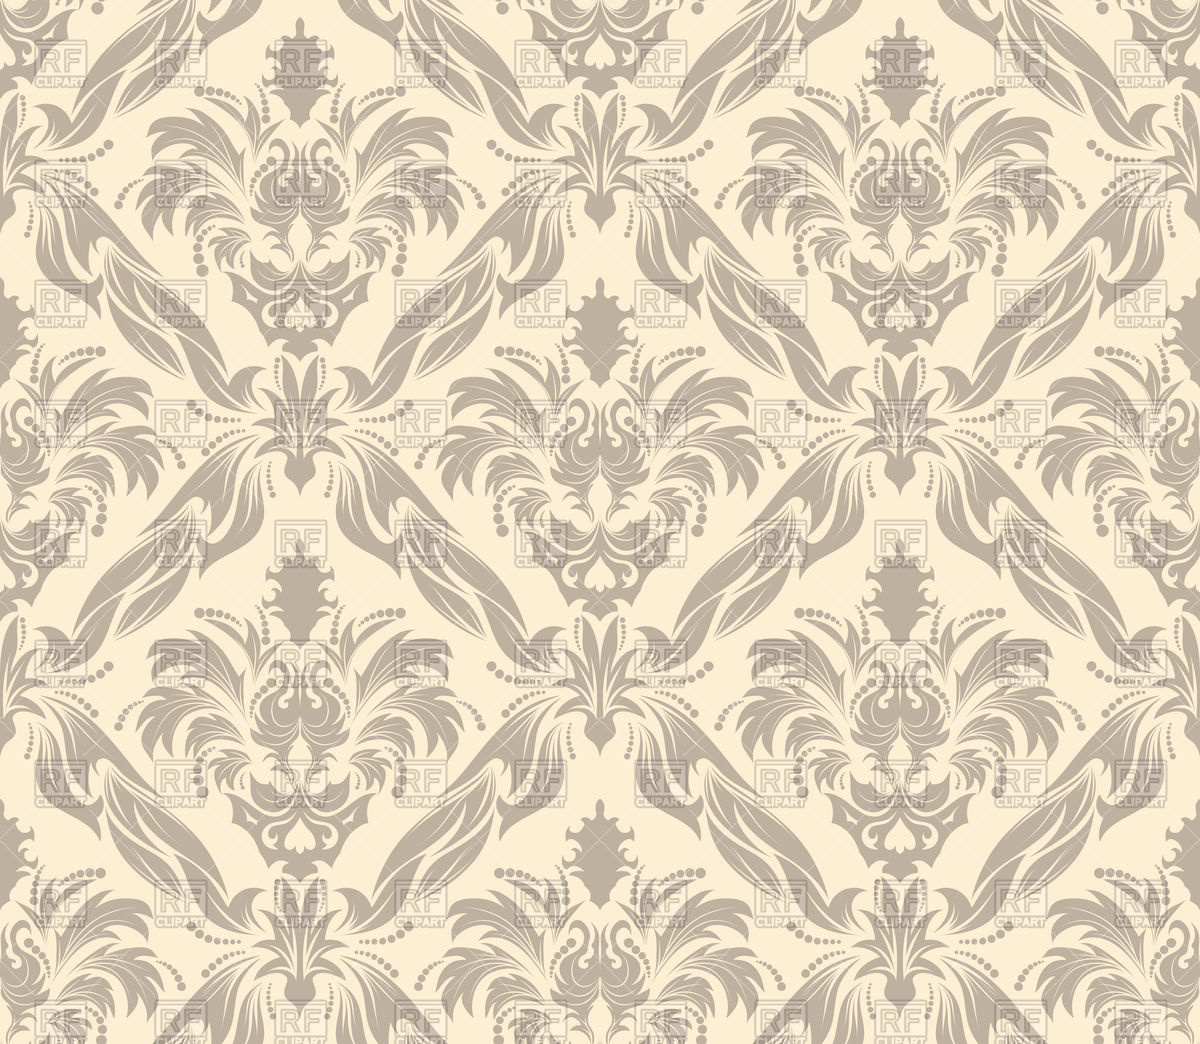 1200x1044 Beige Seamless Old Wallpaper Pattern Vector Image Vector Artwork